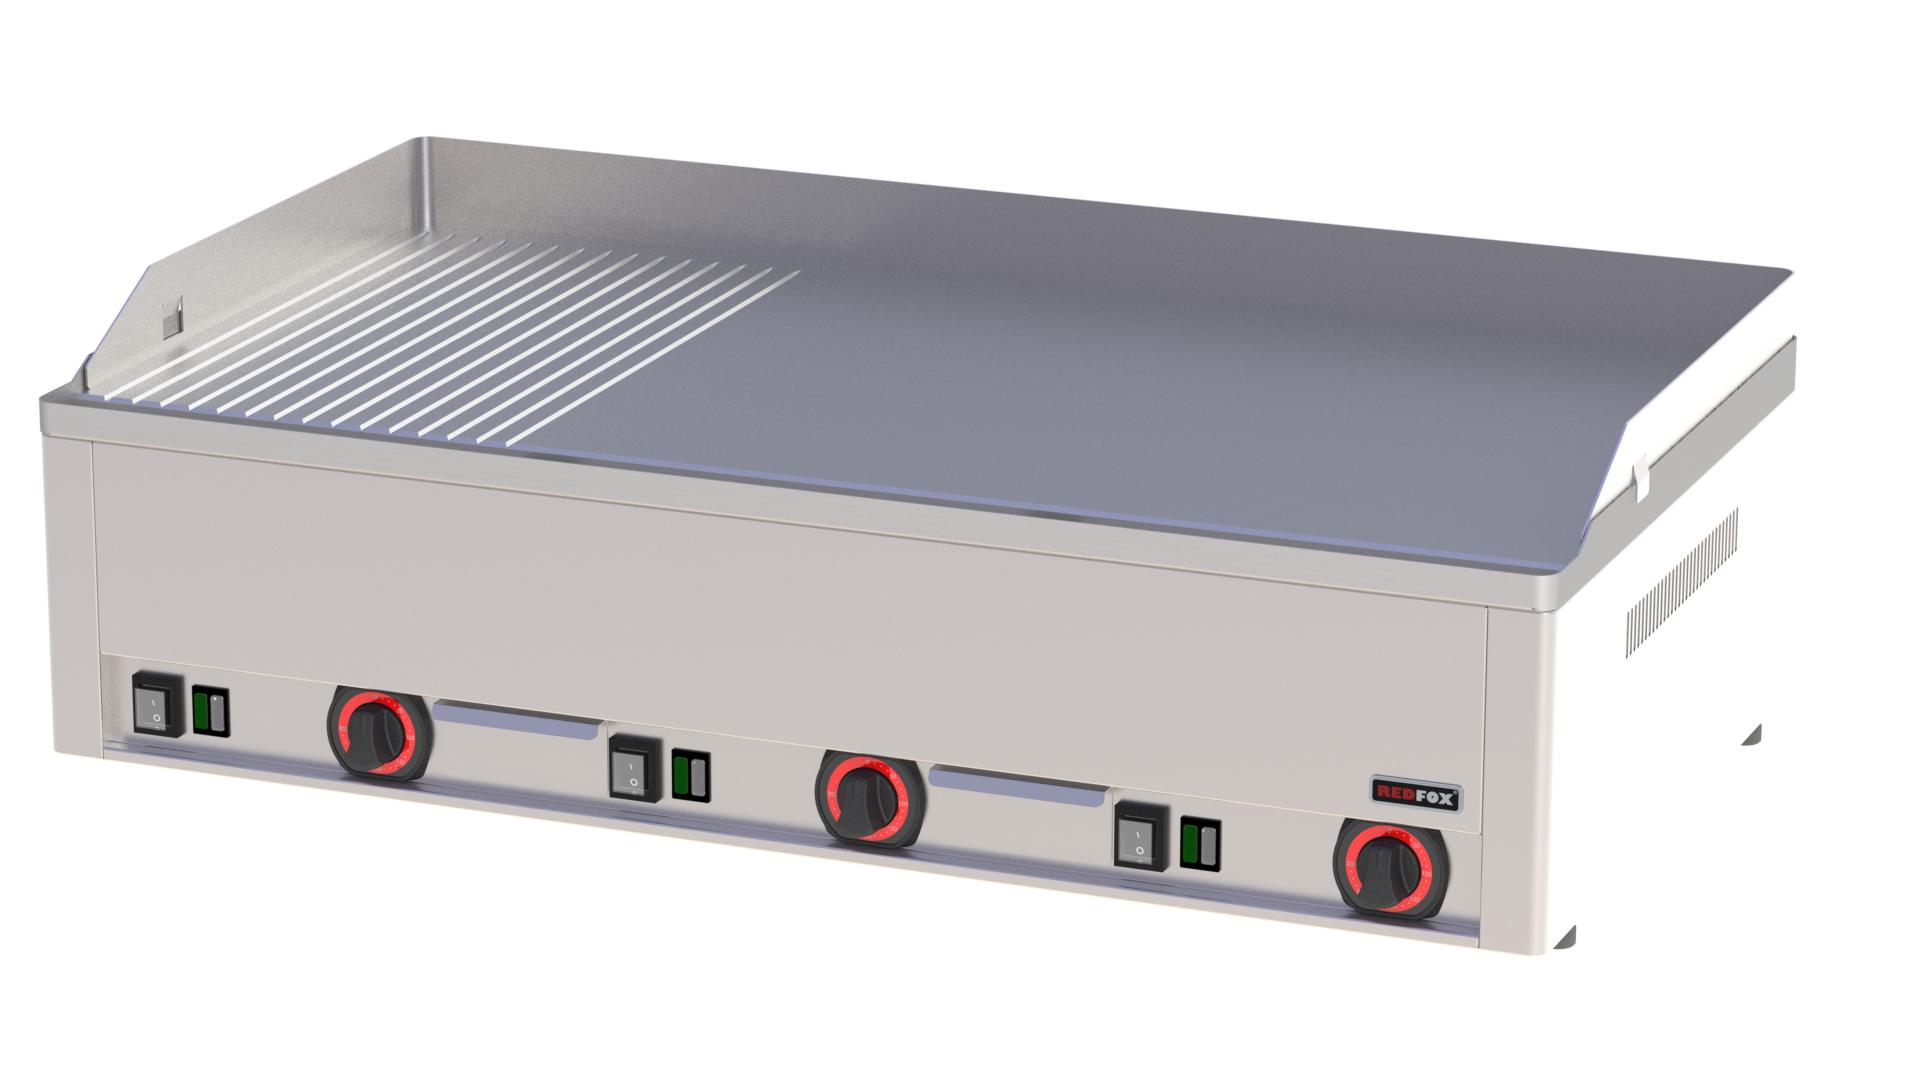 Deska grilovací elektrická FTHR 90 E kombinovaná ocelová RedFox